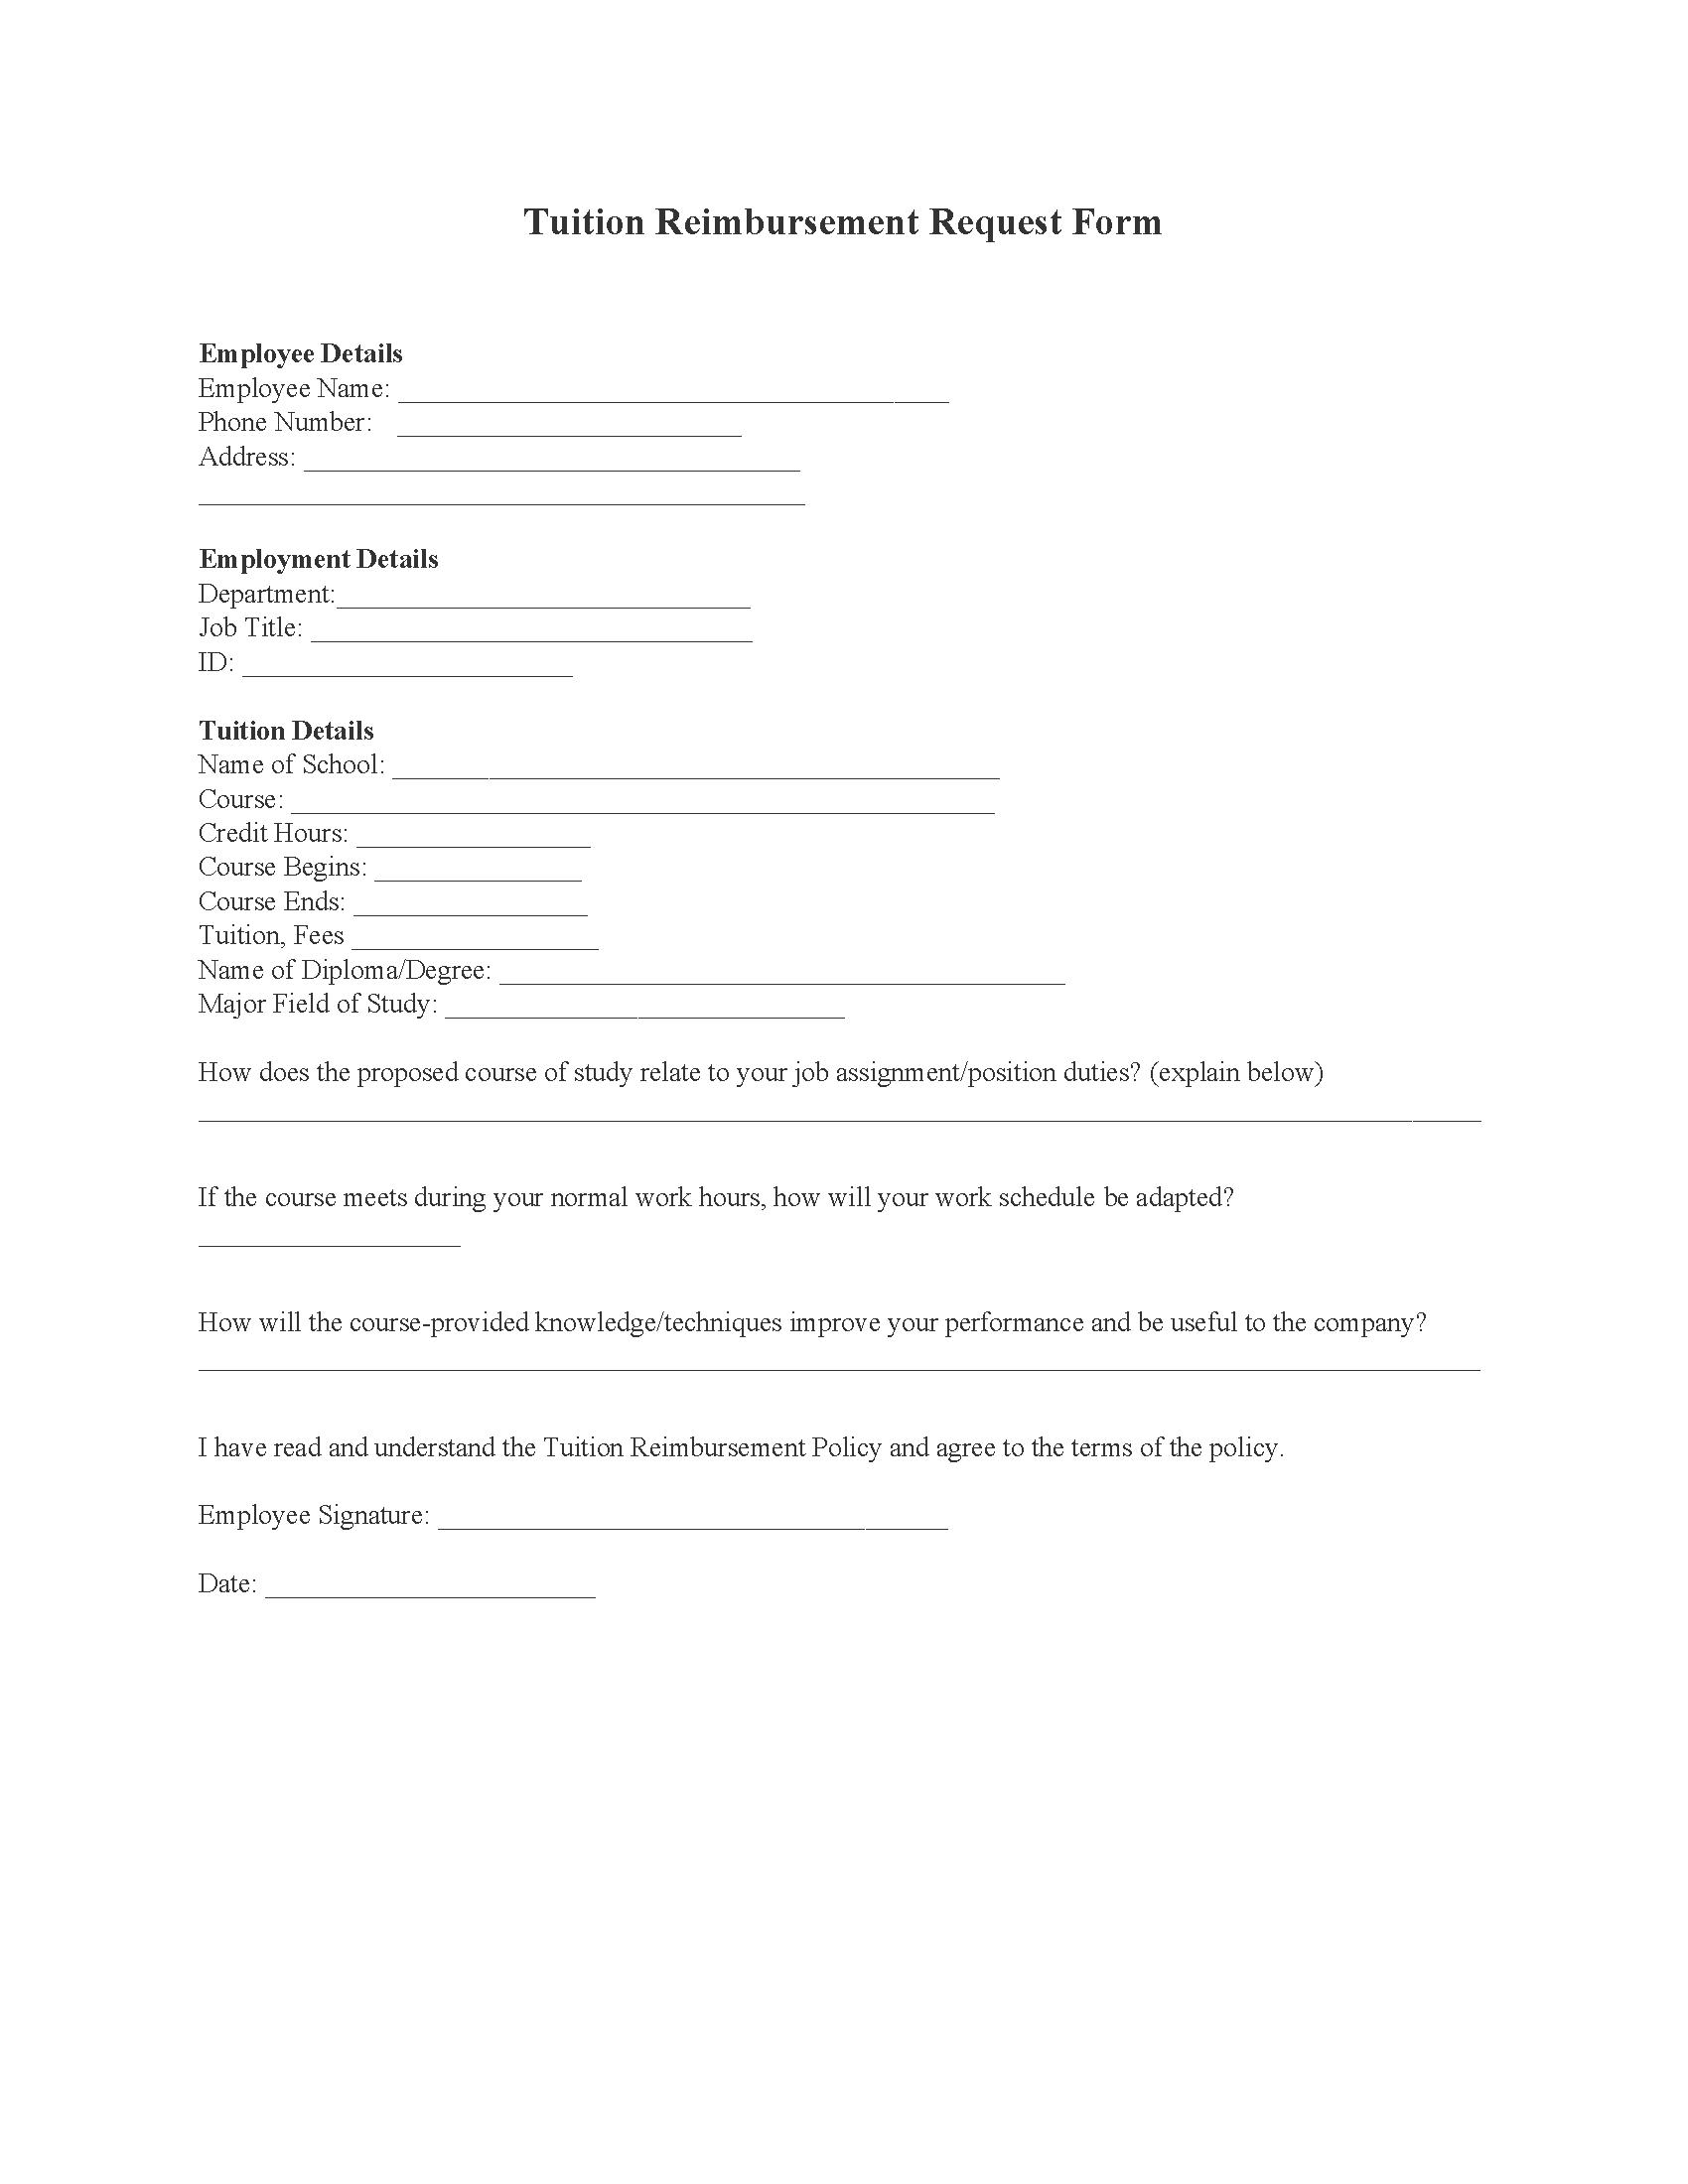 Employee Tuition Reimbursement Form